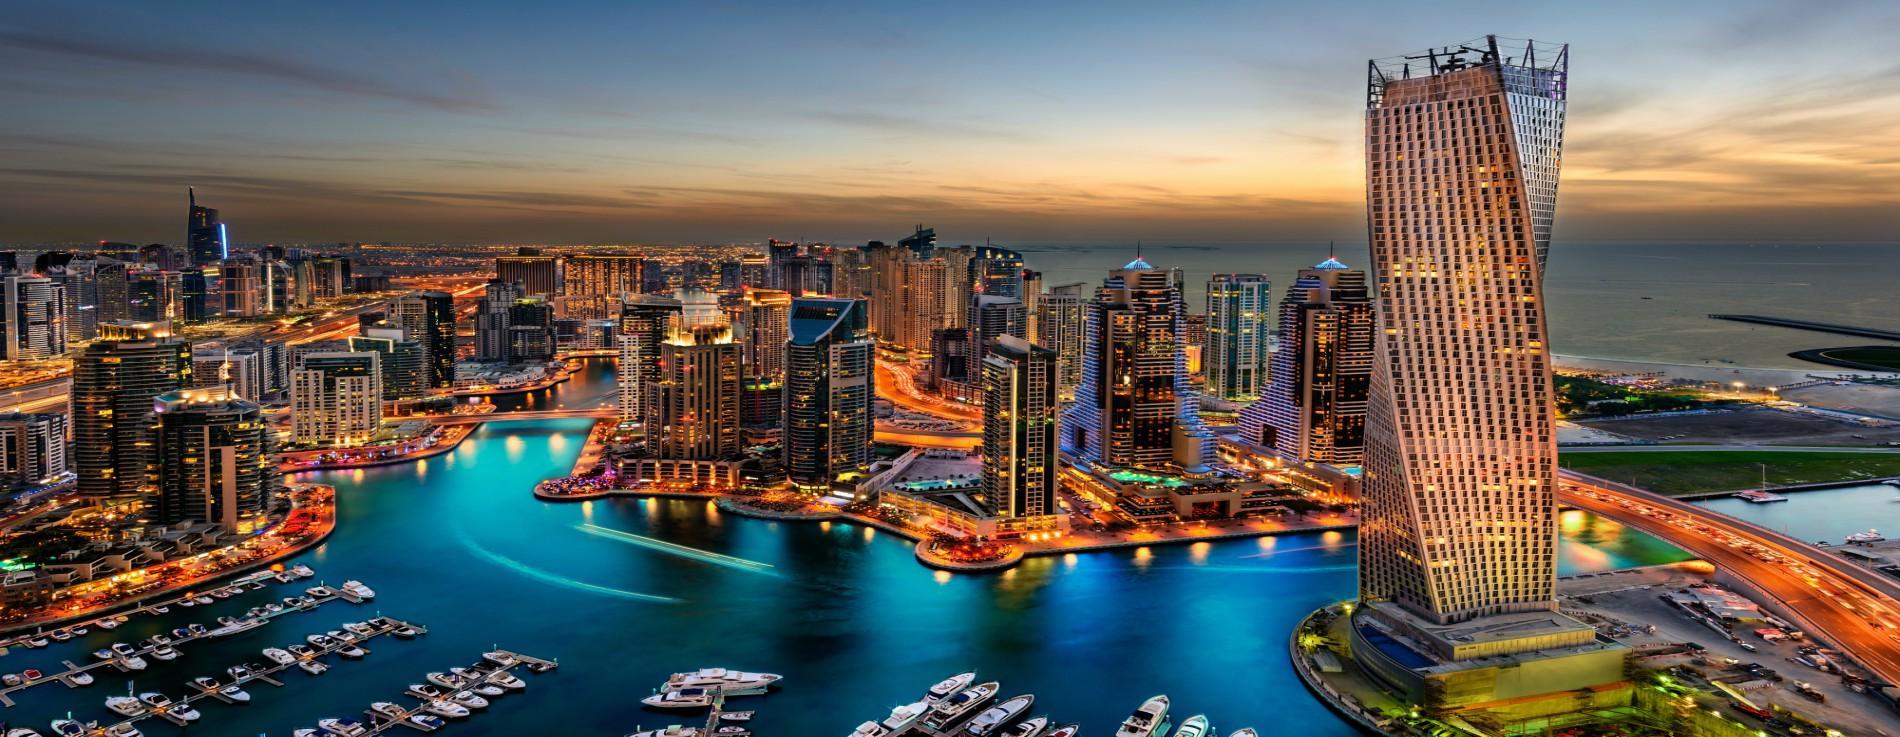 Екскурзии до Дубай